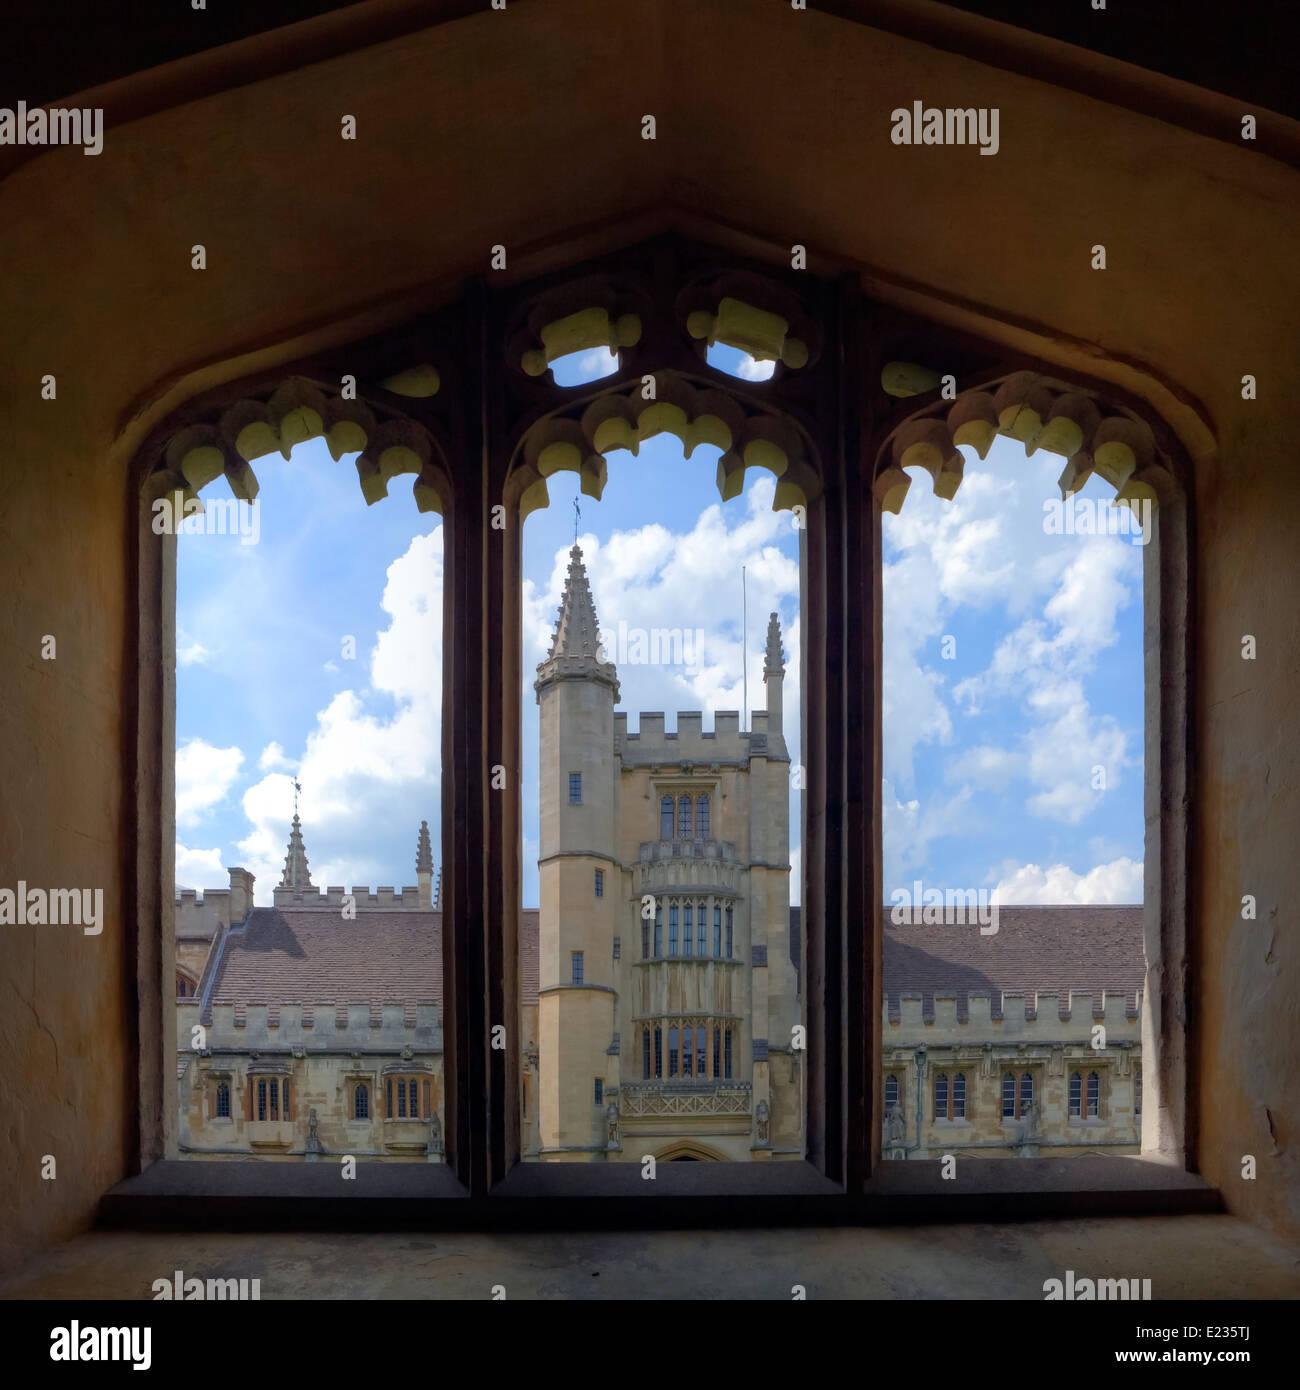 Magdalen College, Oxford, Oxfordshire, England, United Kingdom - Stock Image